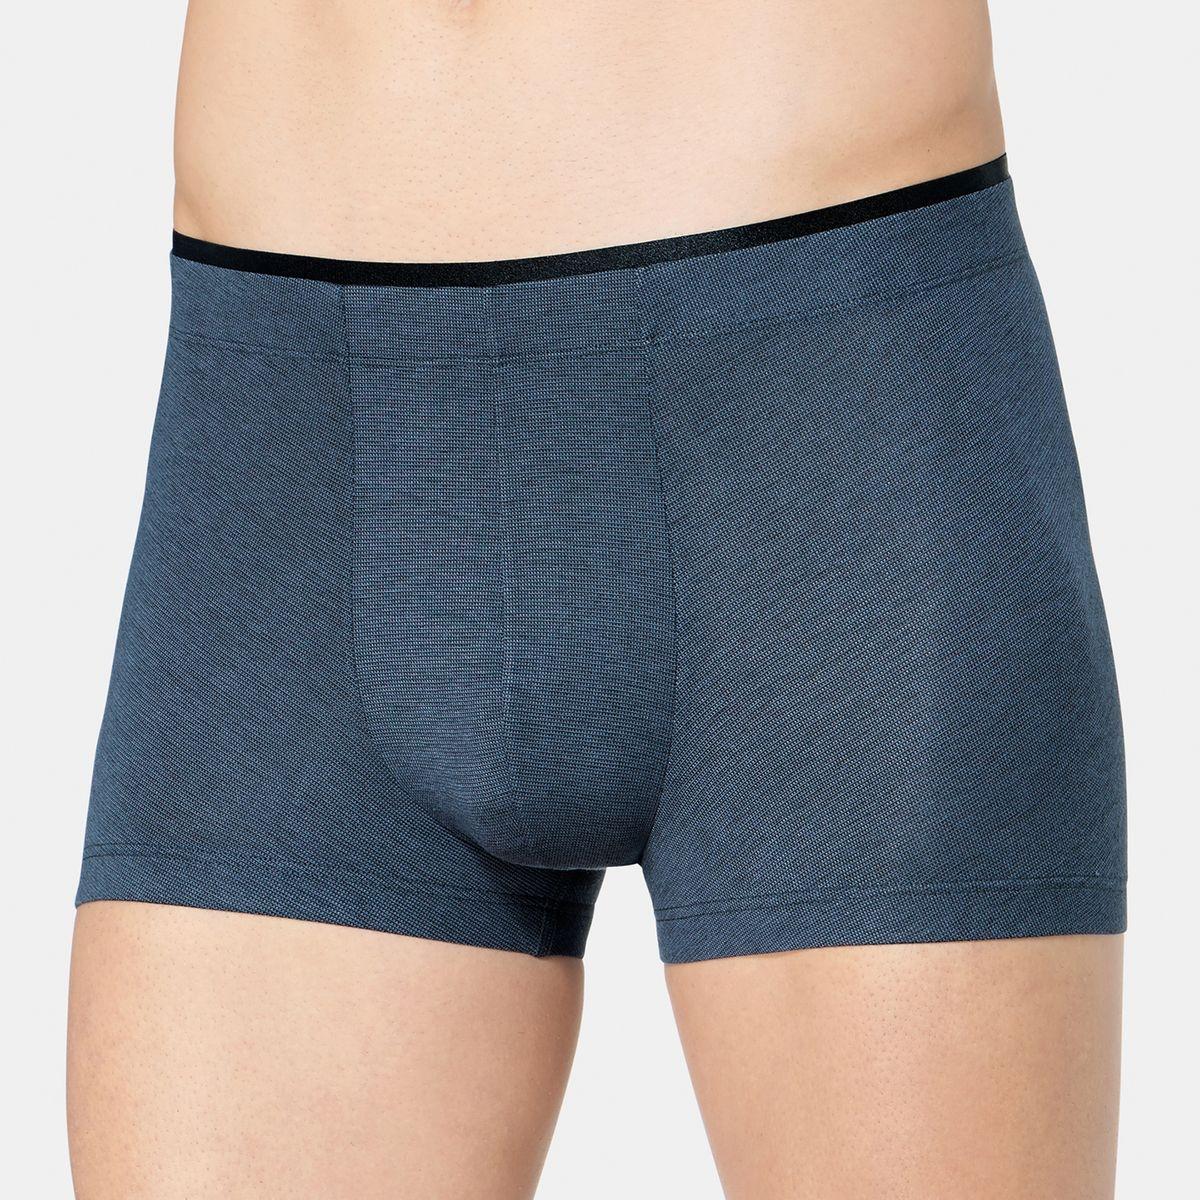 Boxer coton et modal, confortable, invisible